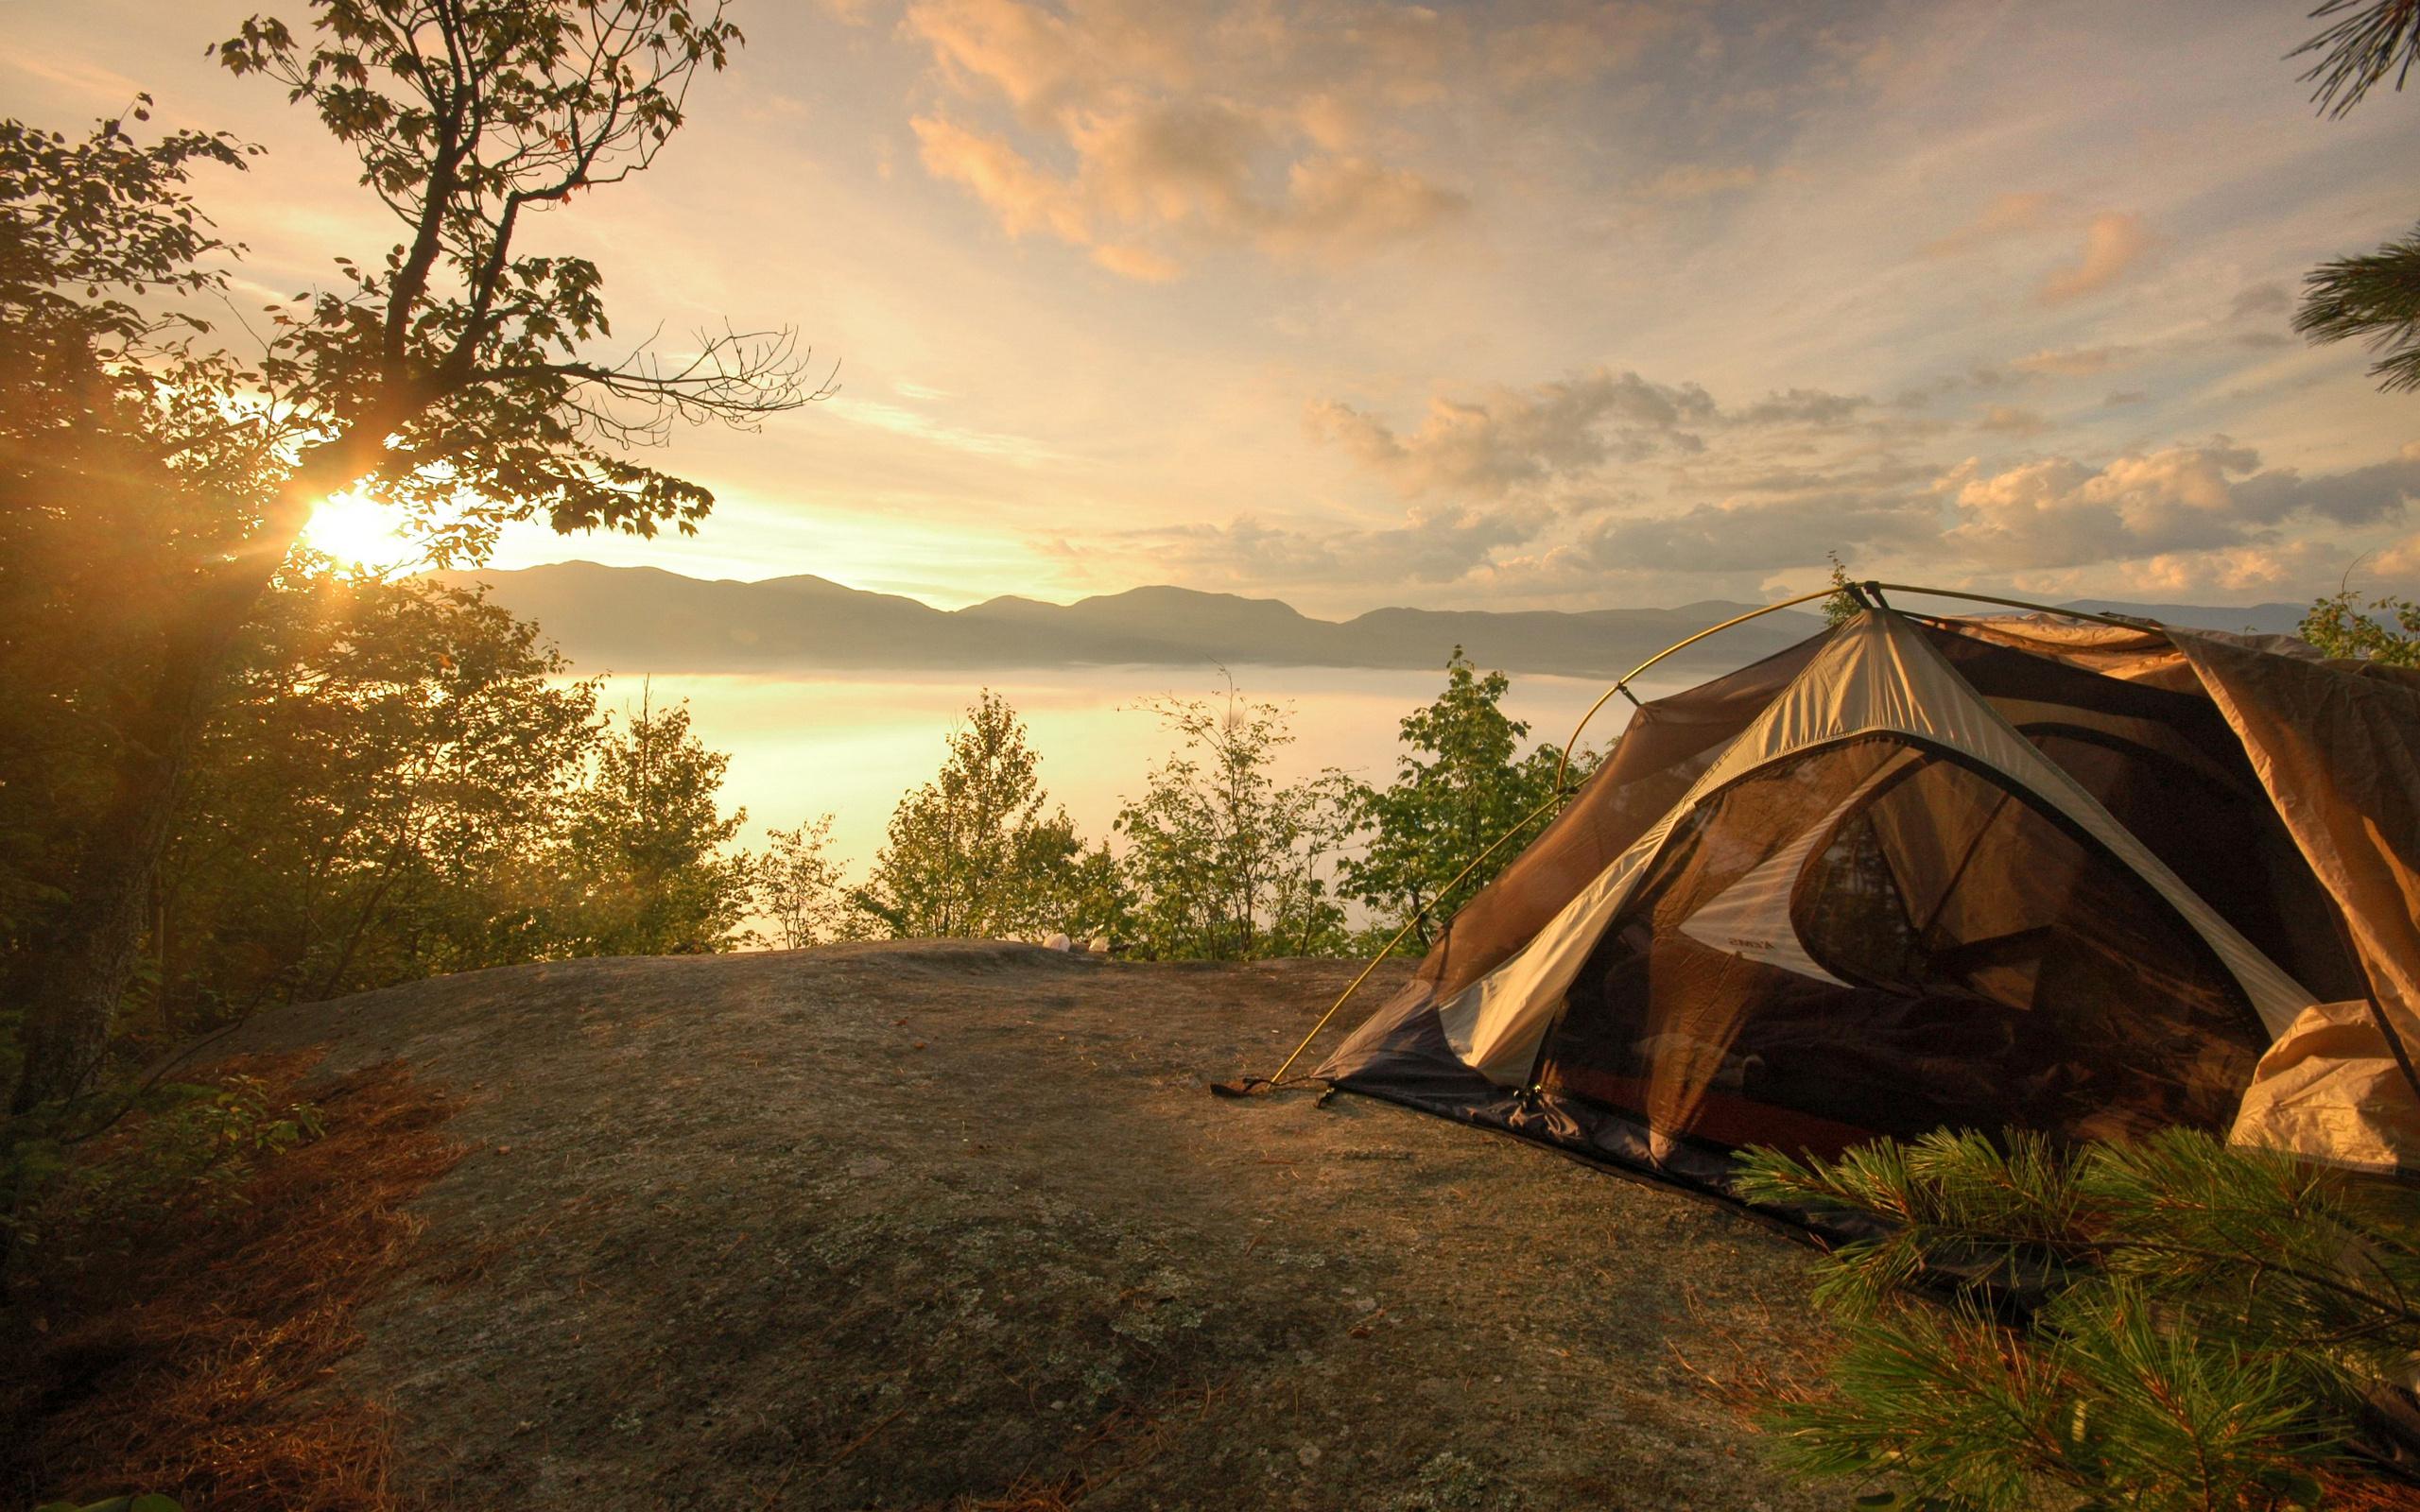 48] Camping Wallpaper Backgrounds on WallpaperSafari 2560x1600